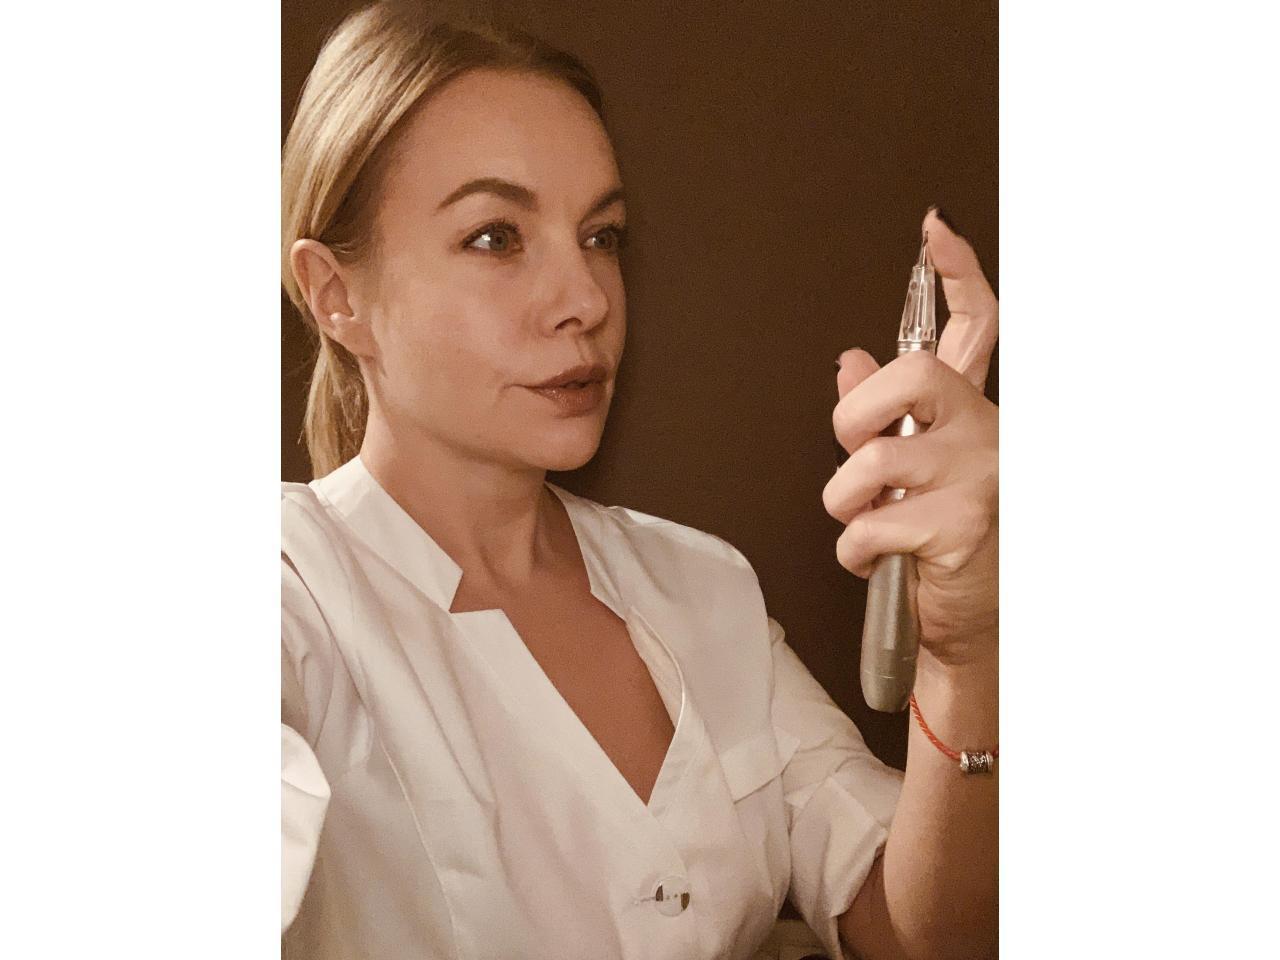 Permanent makeup artist/Microblading - 6